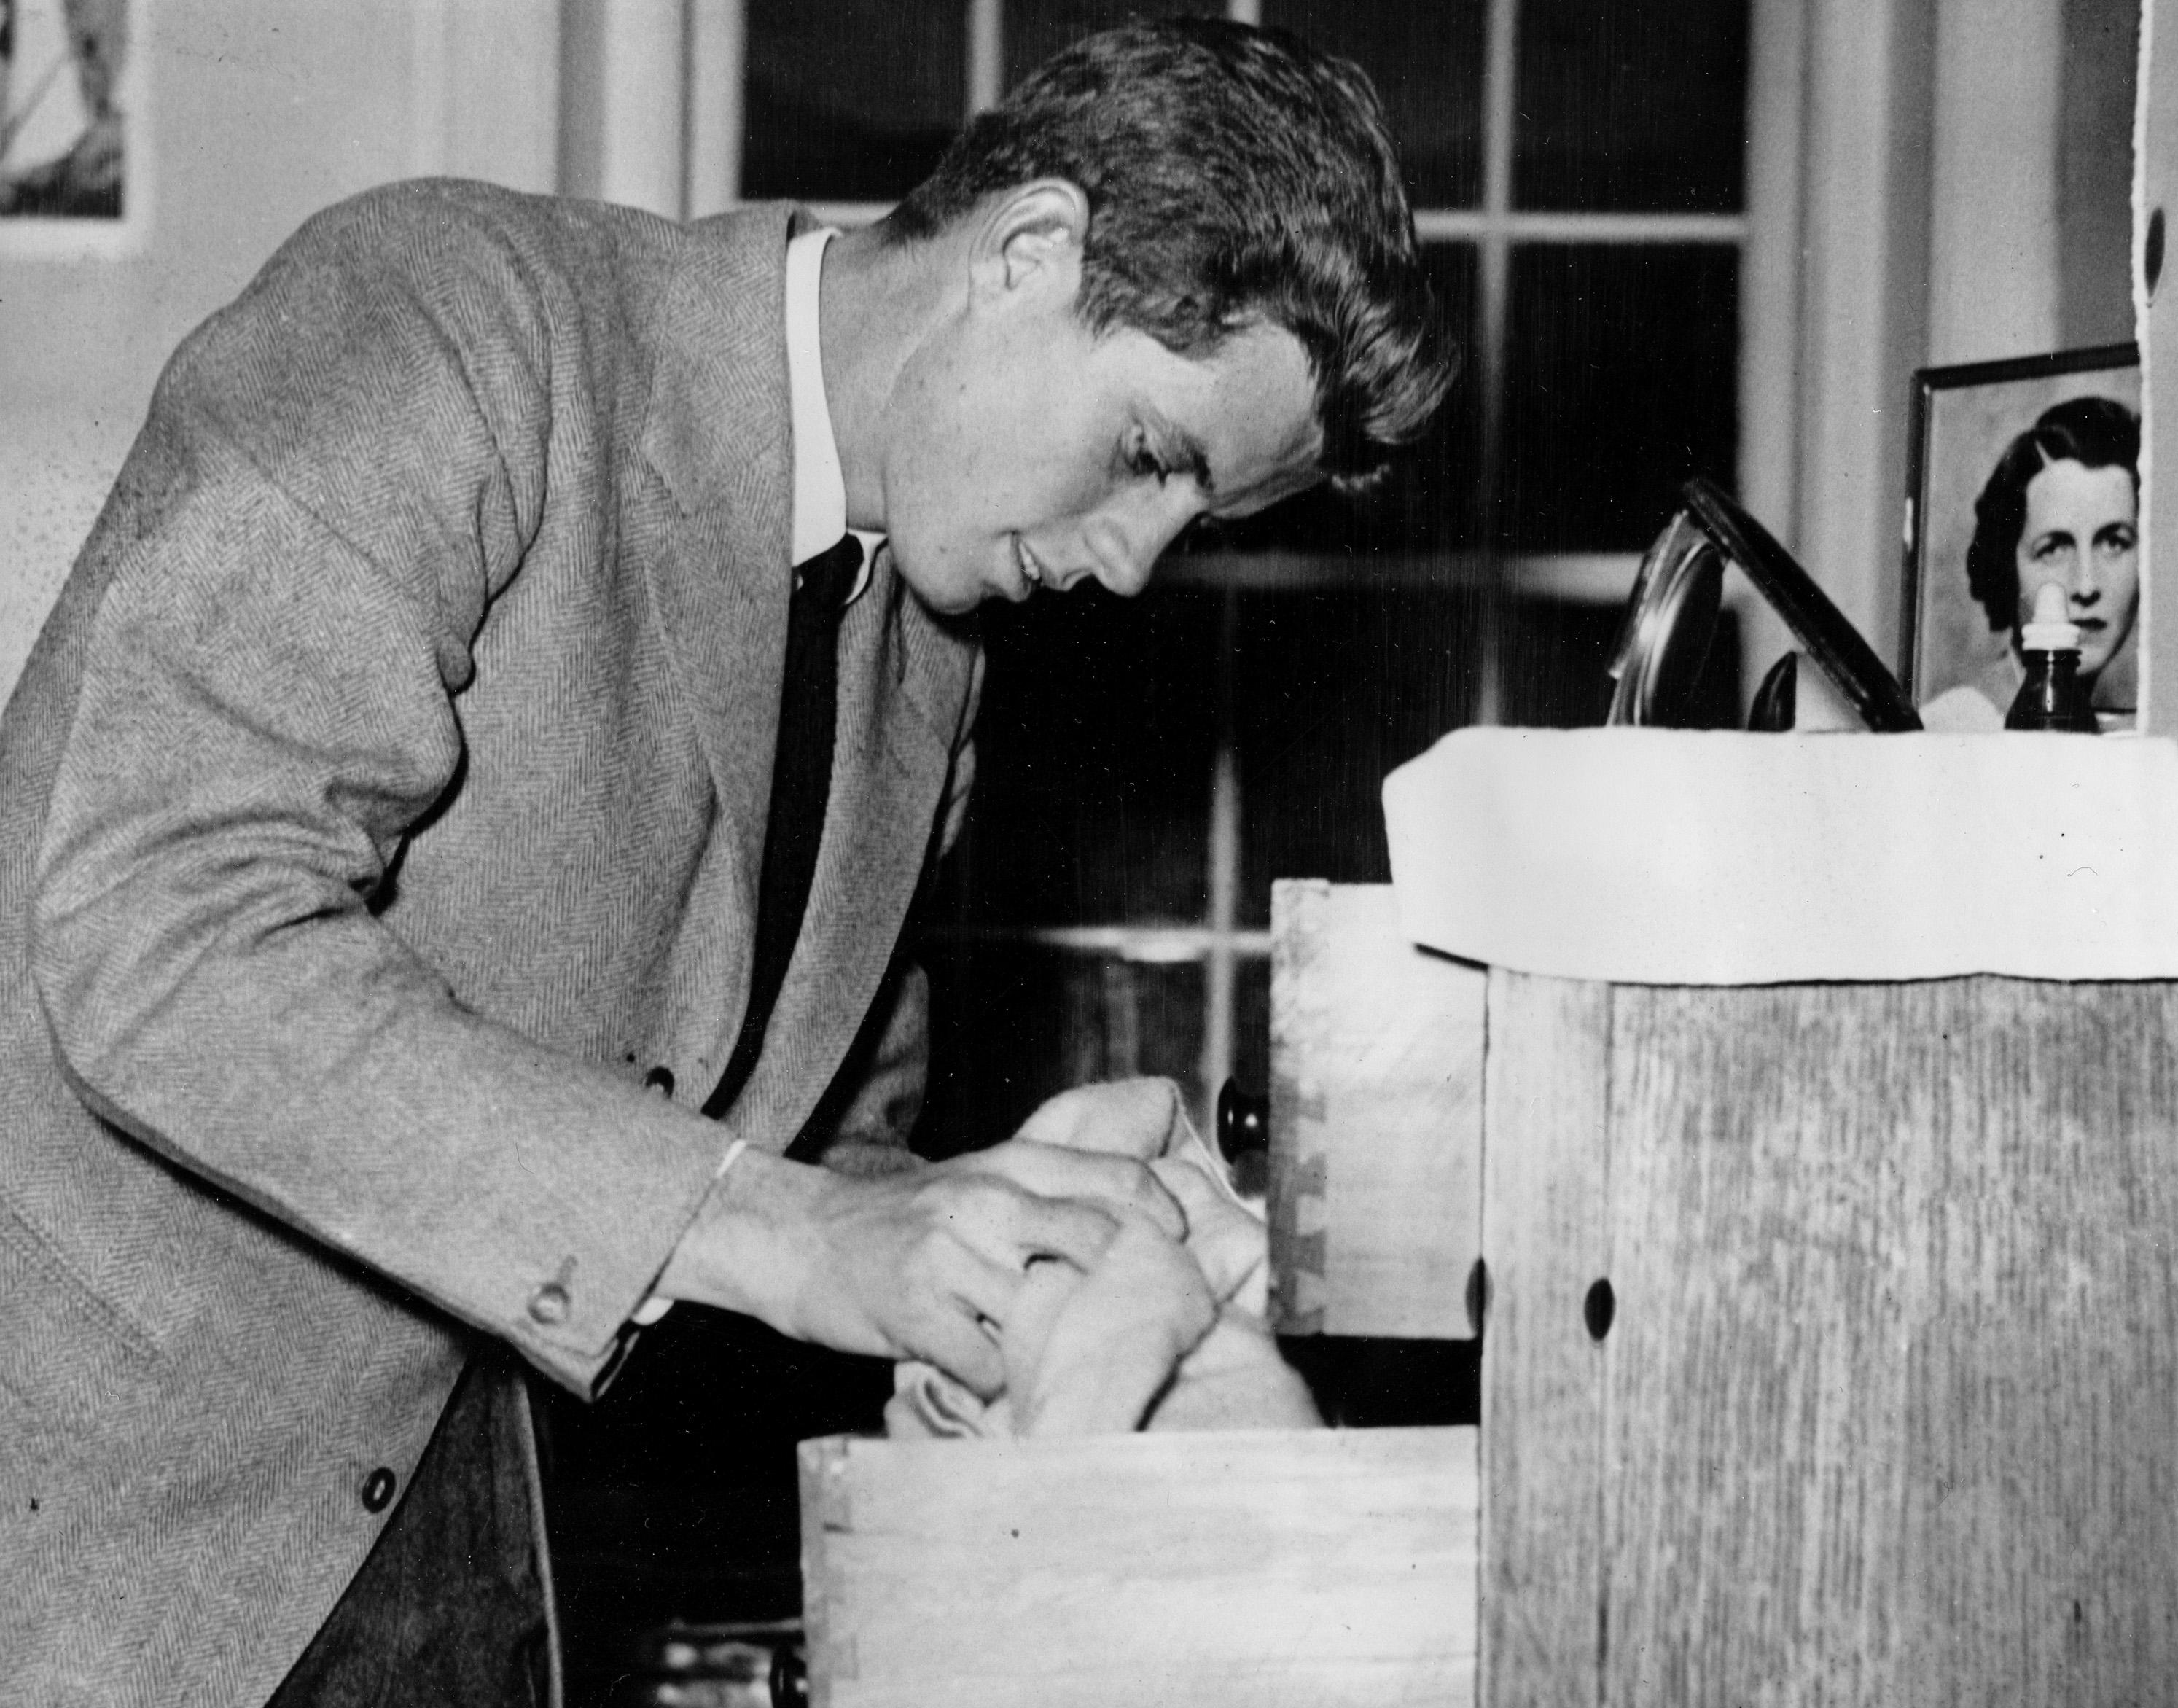 John F. Kennedy, in his junior year at Harvard University, is shown at Harvard's Winthrop House in Cambridge, Ma., Jan. 24, 1939.